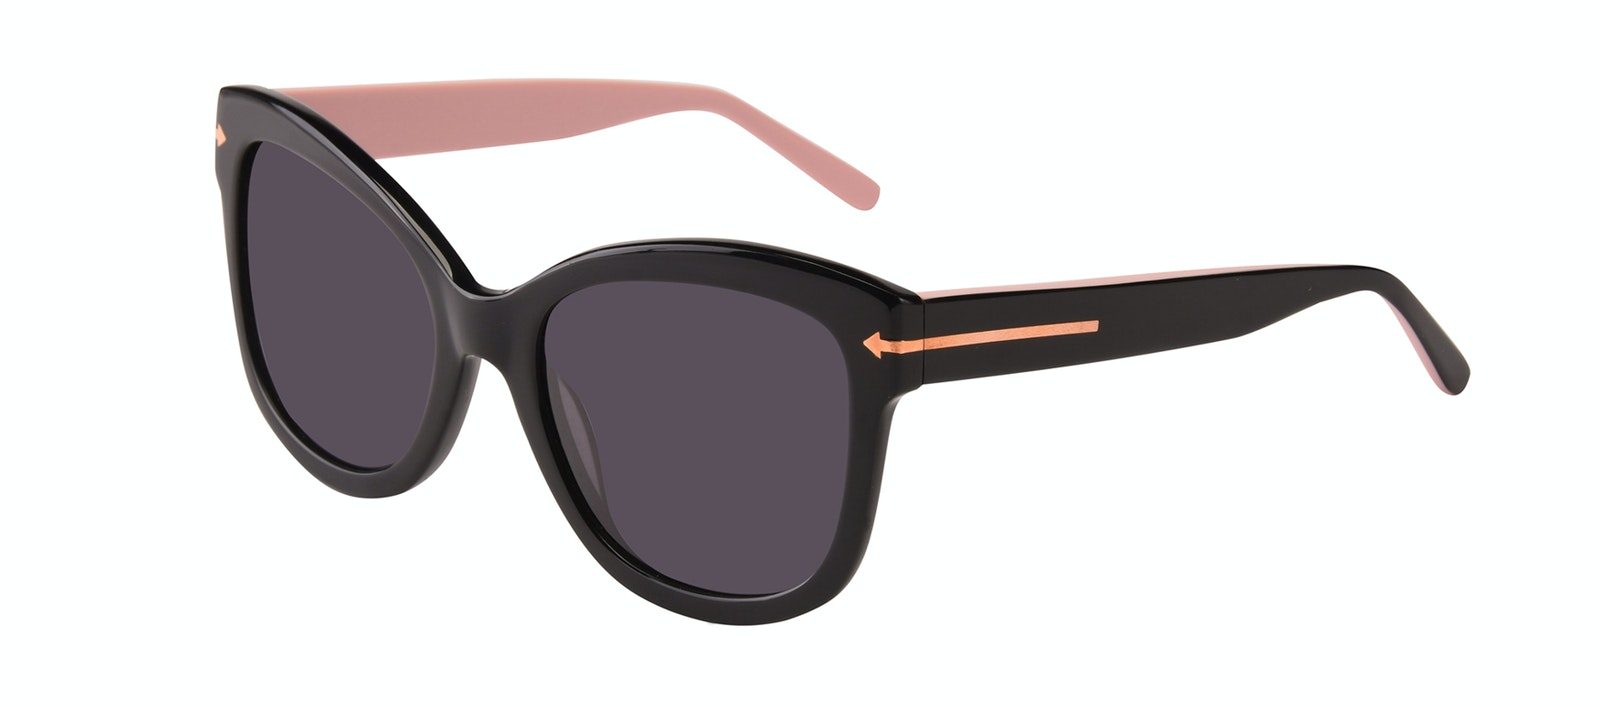 Affordable Fashion Glasses Cat Eye Square Sunglasses Women Marlo Carbon Tilt